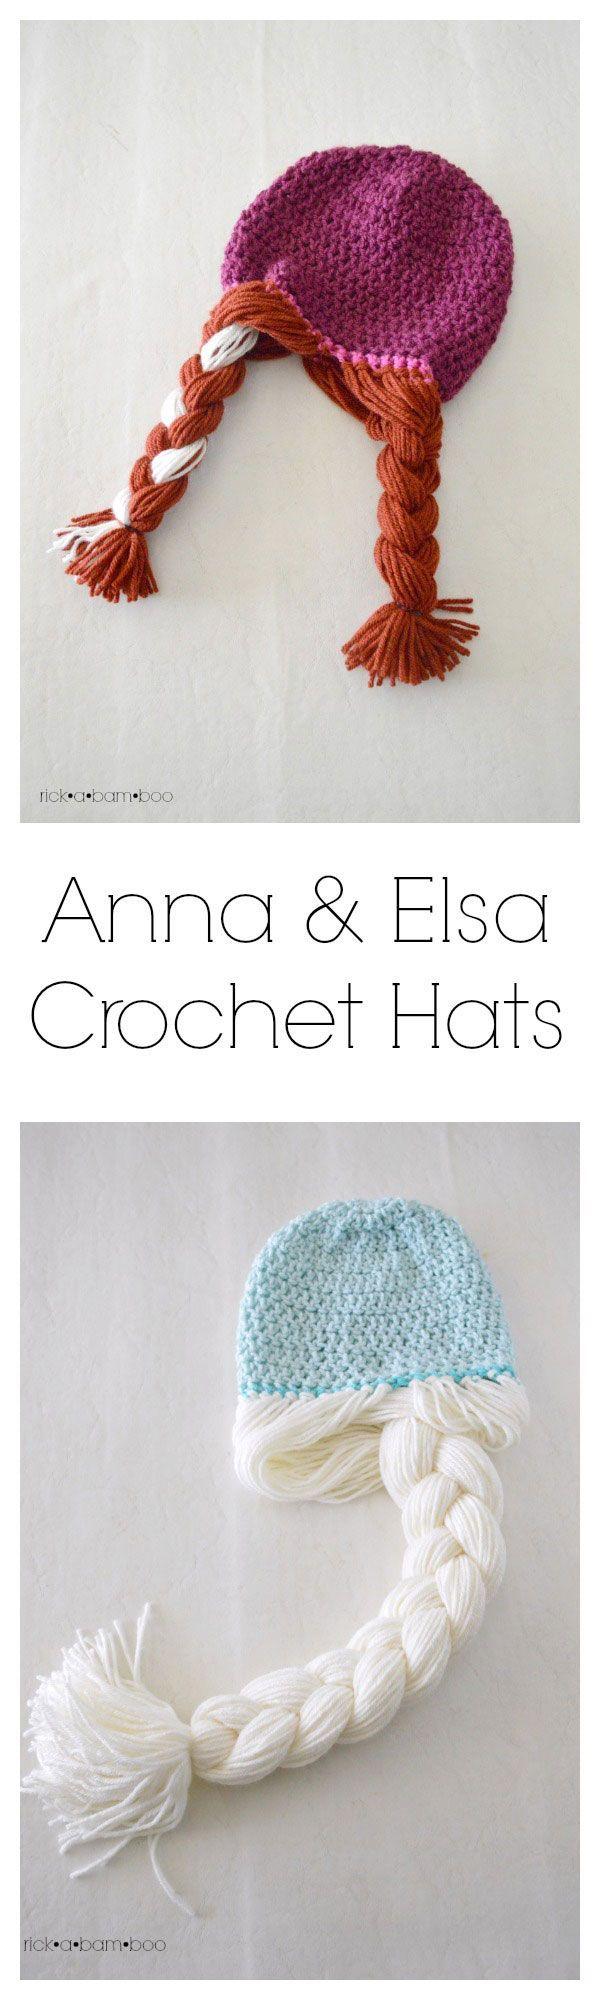 TOP 10 Free Crochet Patterns Inspired by Disney | Gorros, Patrón ...